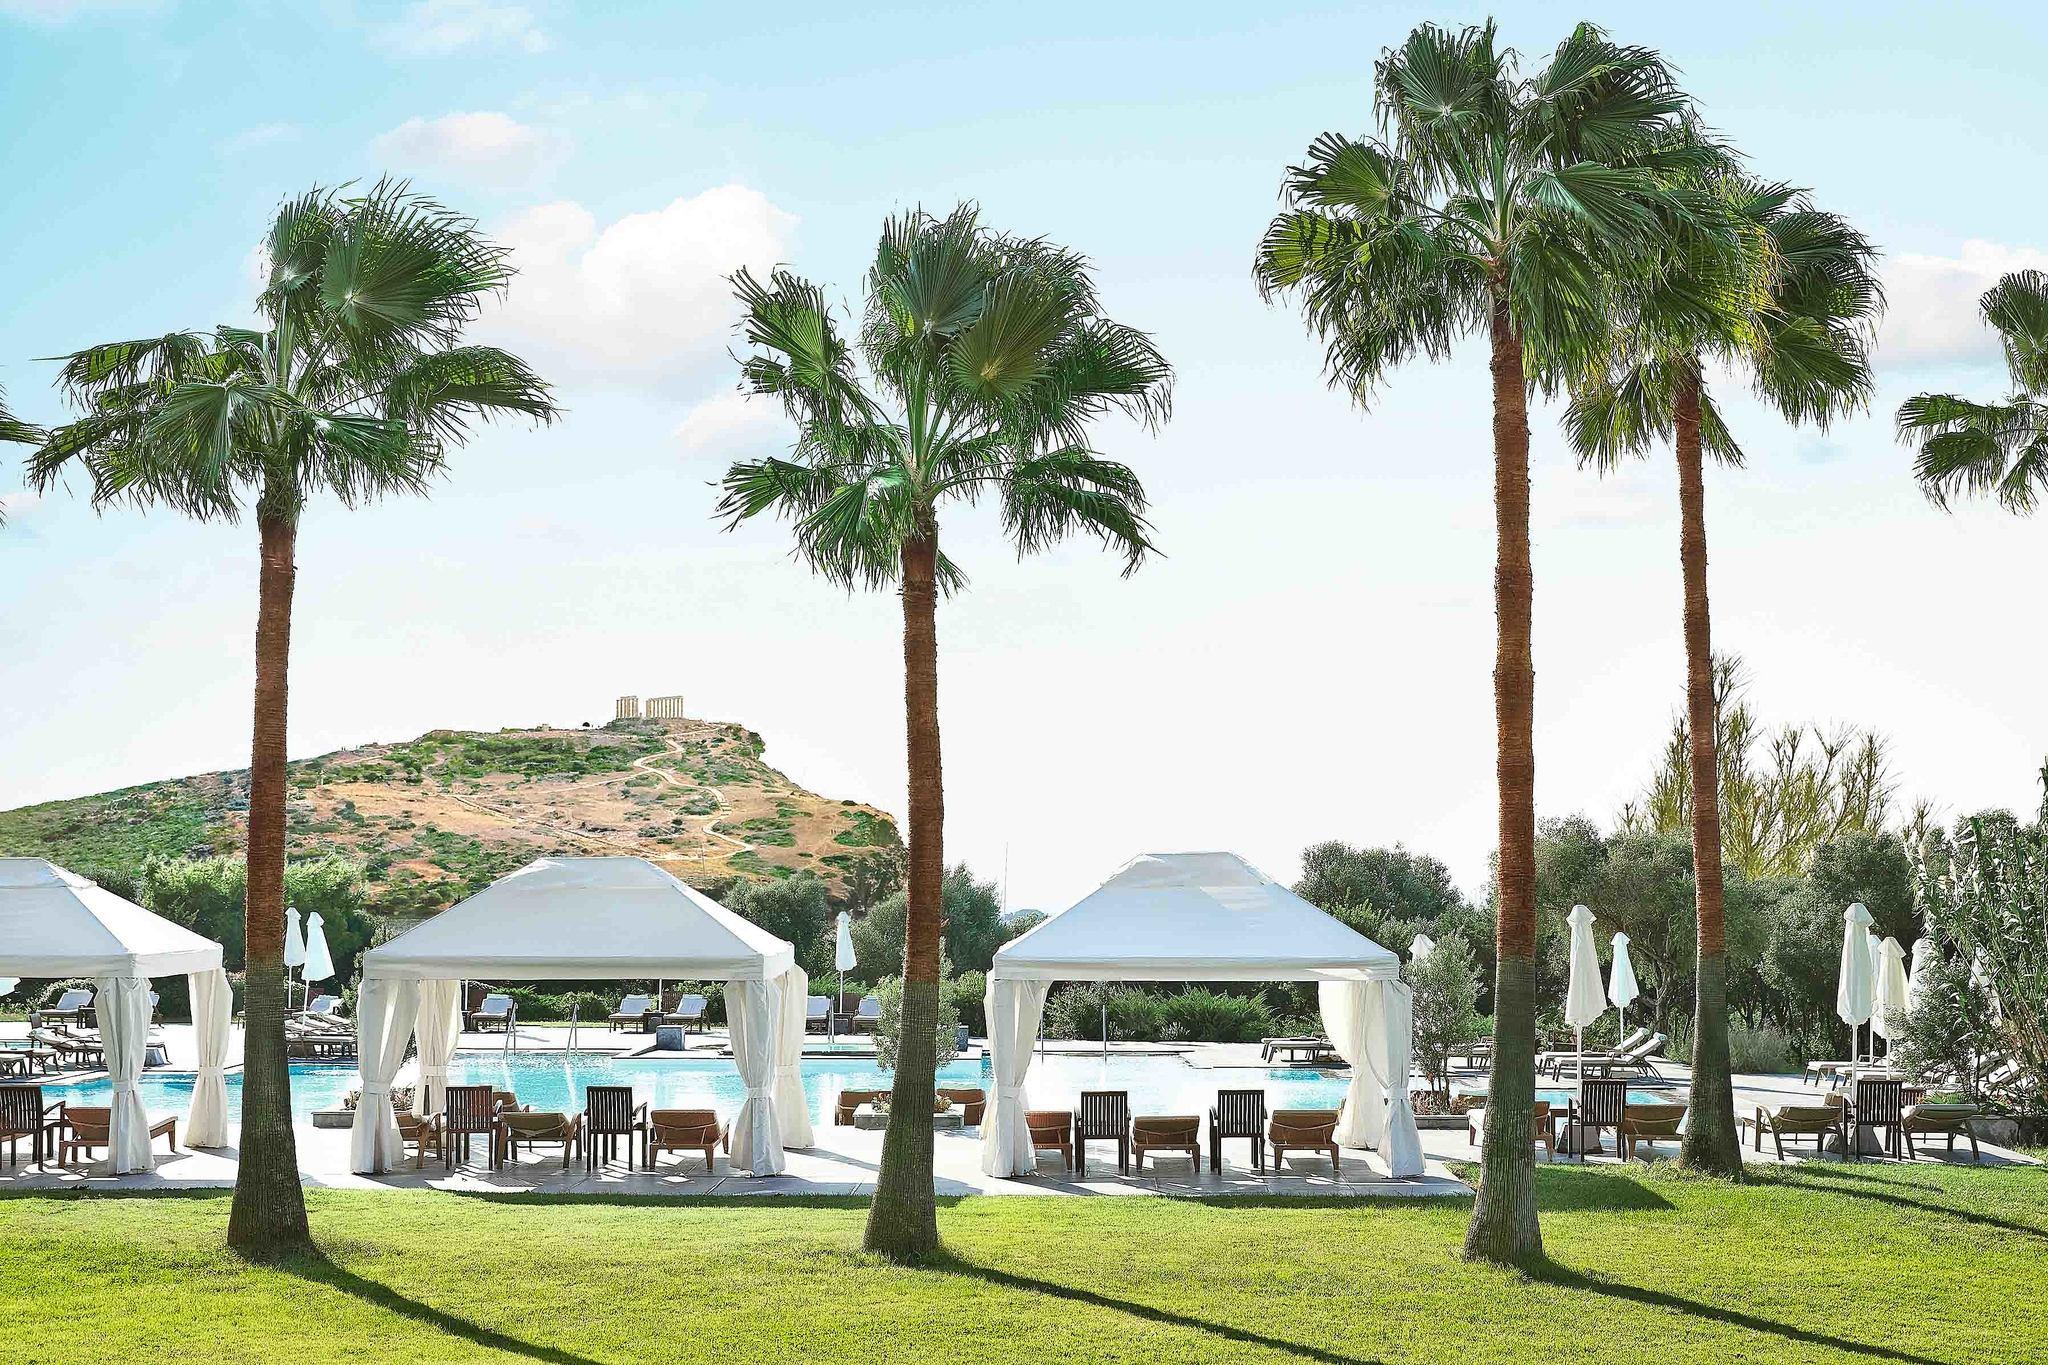 grecotel Cape Sounion, Luxury Hotels, Greece Hotels, Luxury holiday, Hotel rent, Greece hotel rent, vip hotel, Luxury Hotels, Greece Hotels, Luxury holiday, Hotel rent, Greece hotel rent, cape sounio